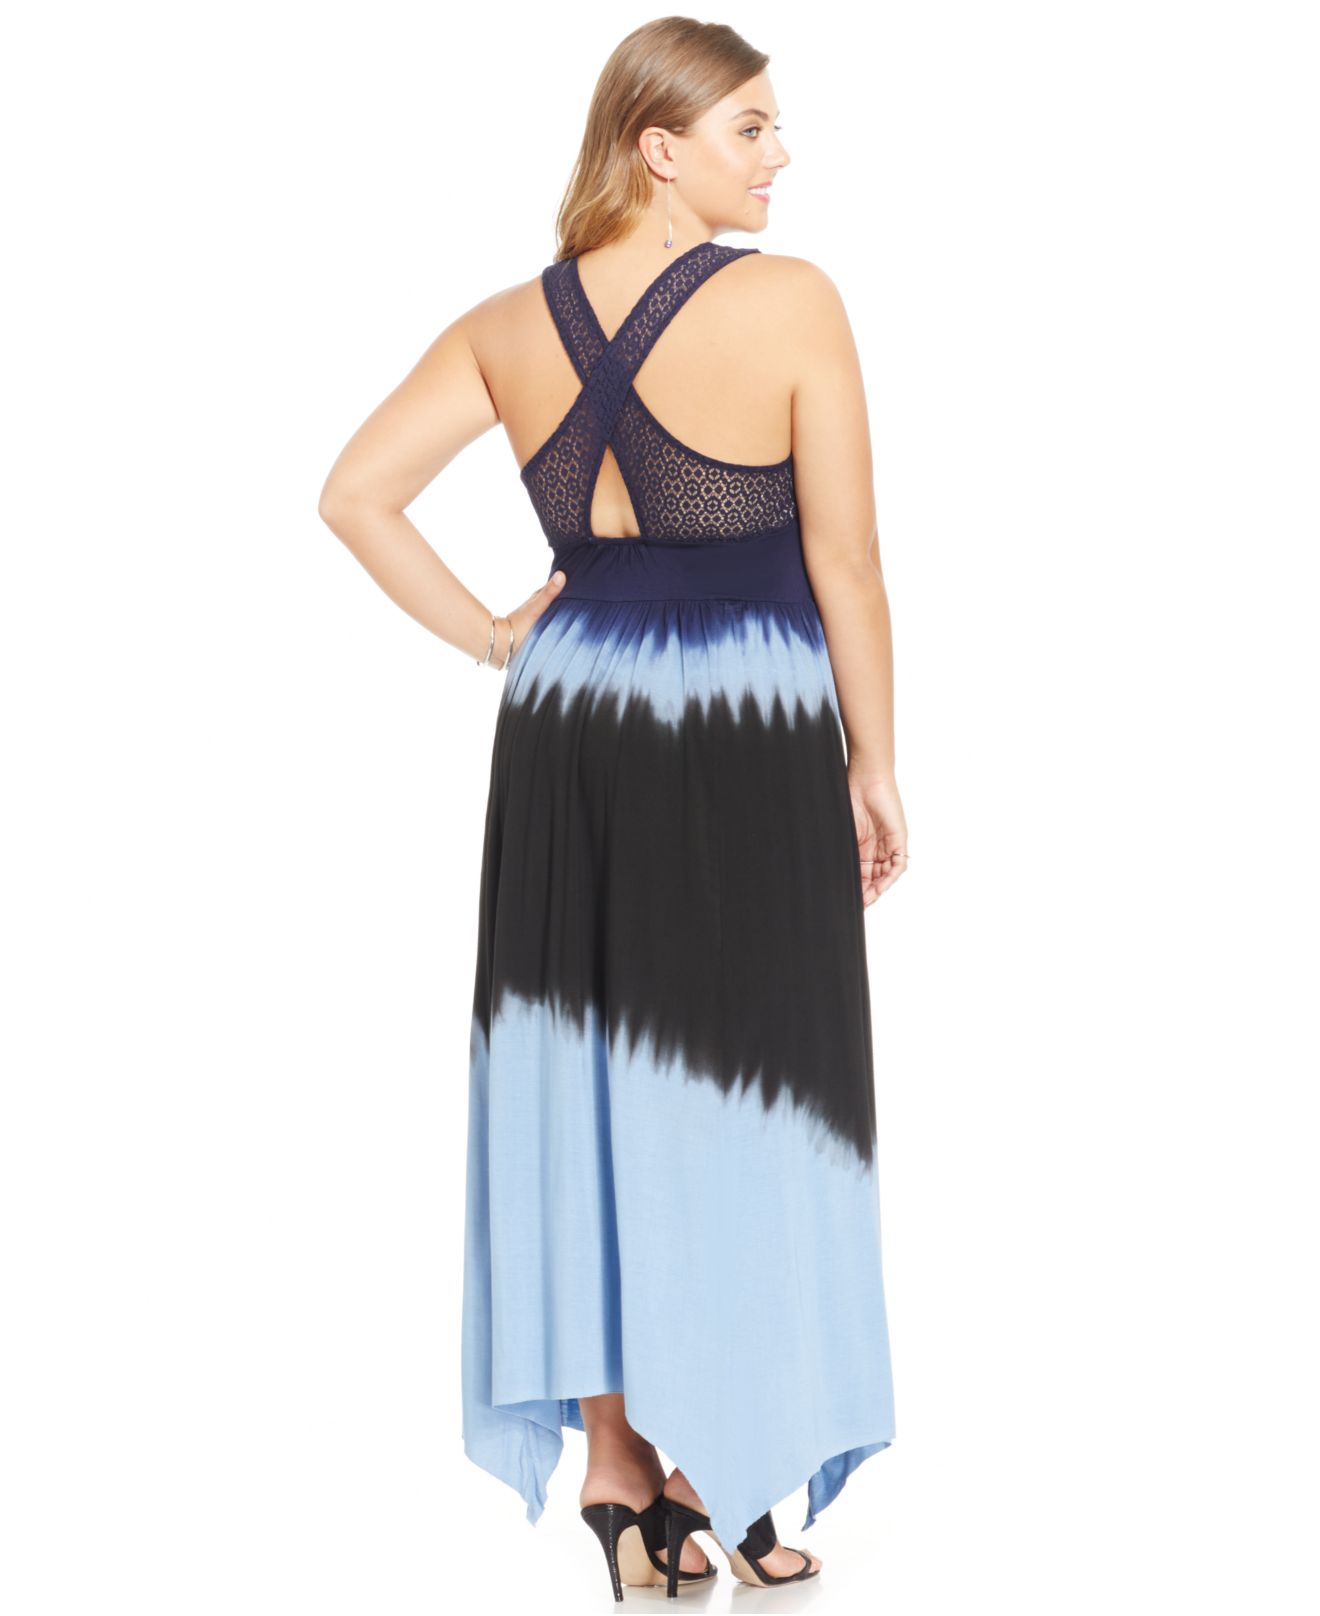 Plus Size Cross-Back Tie-Dye Maxi Dress